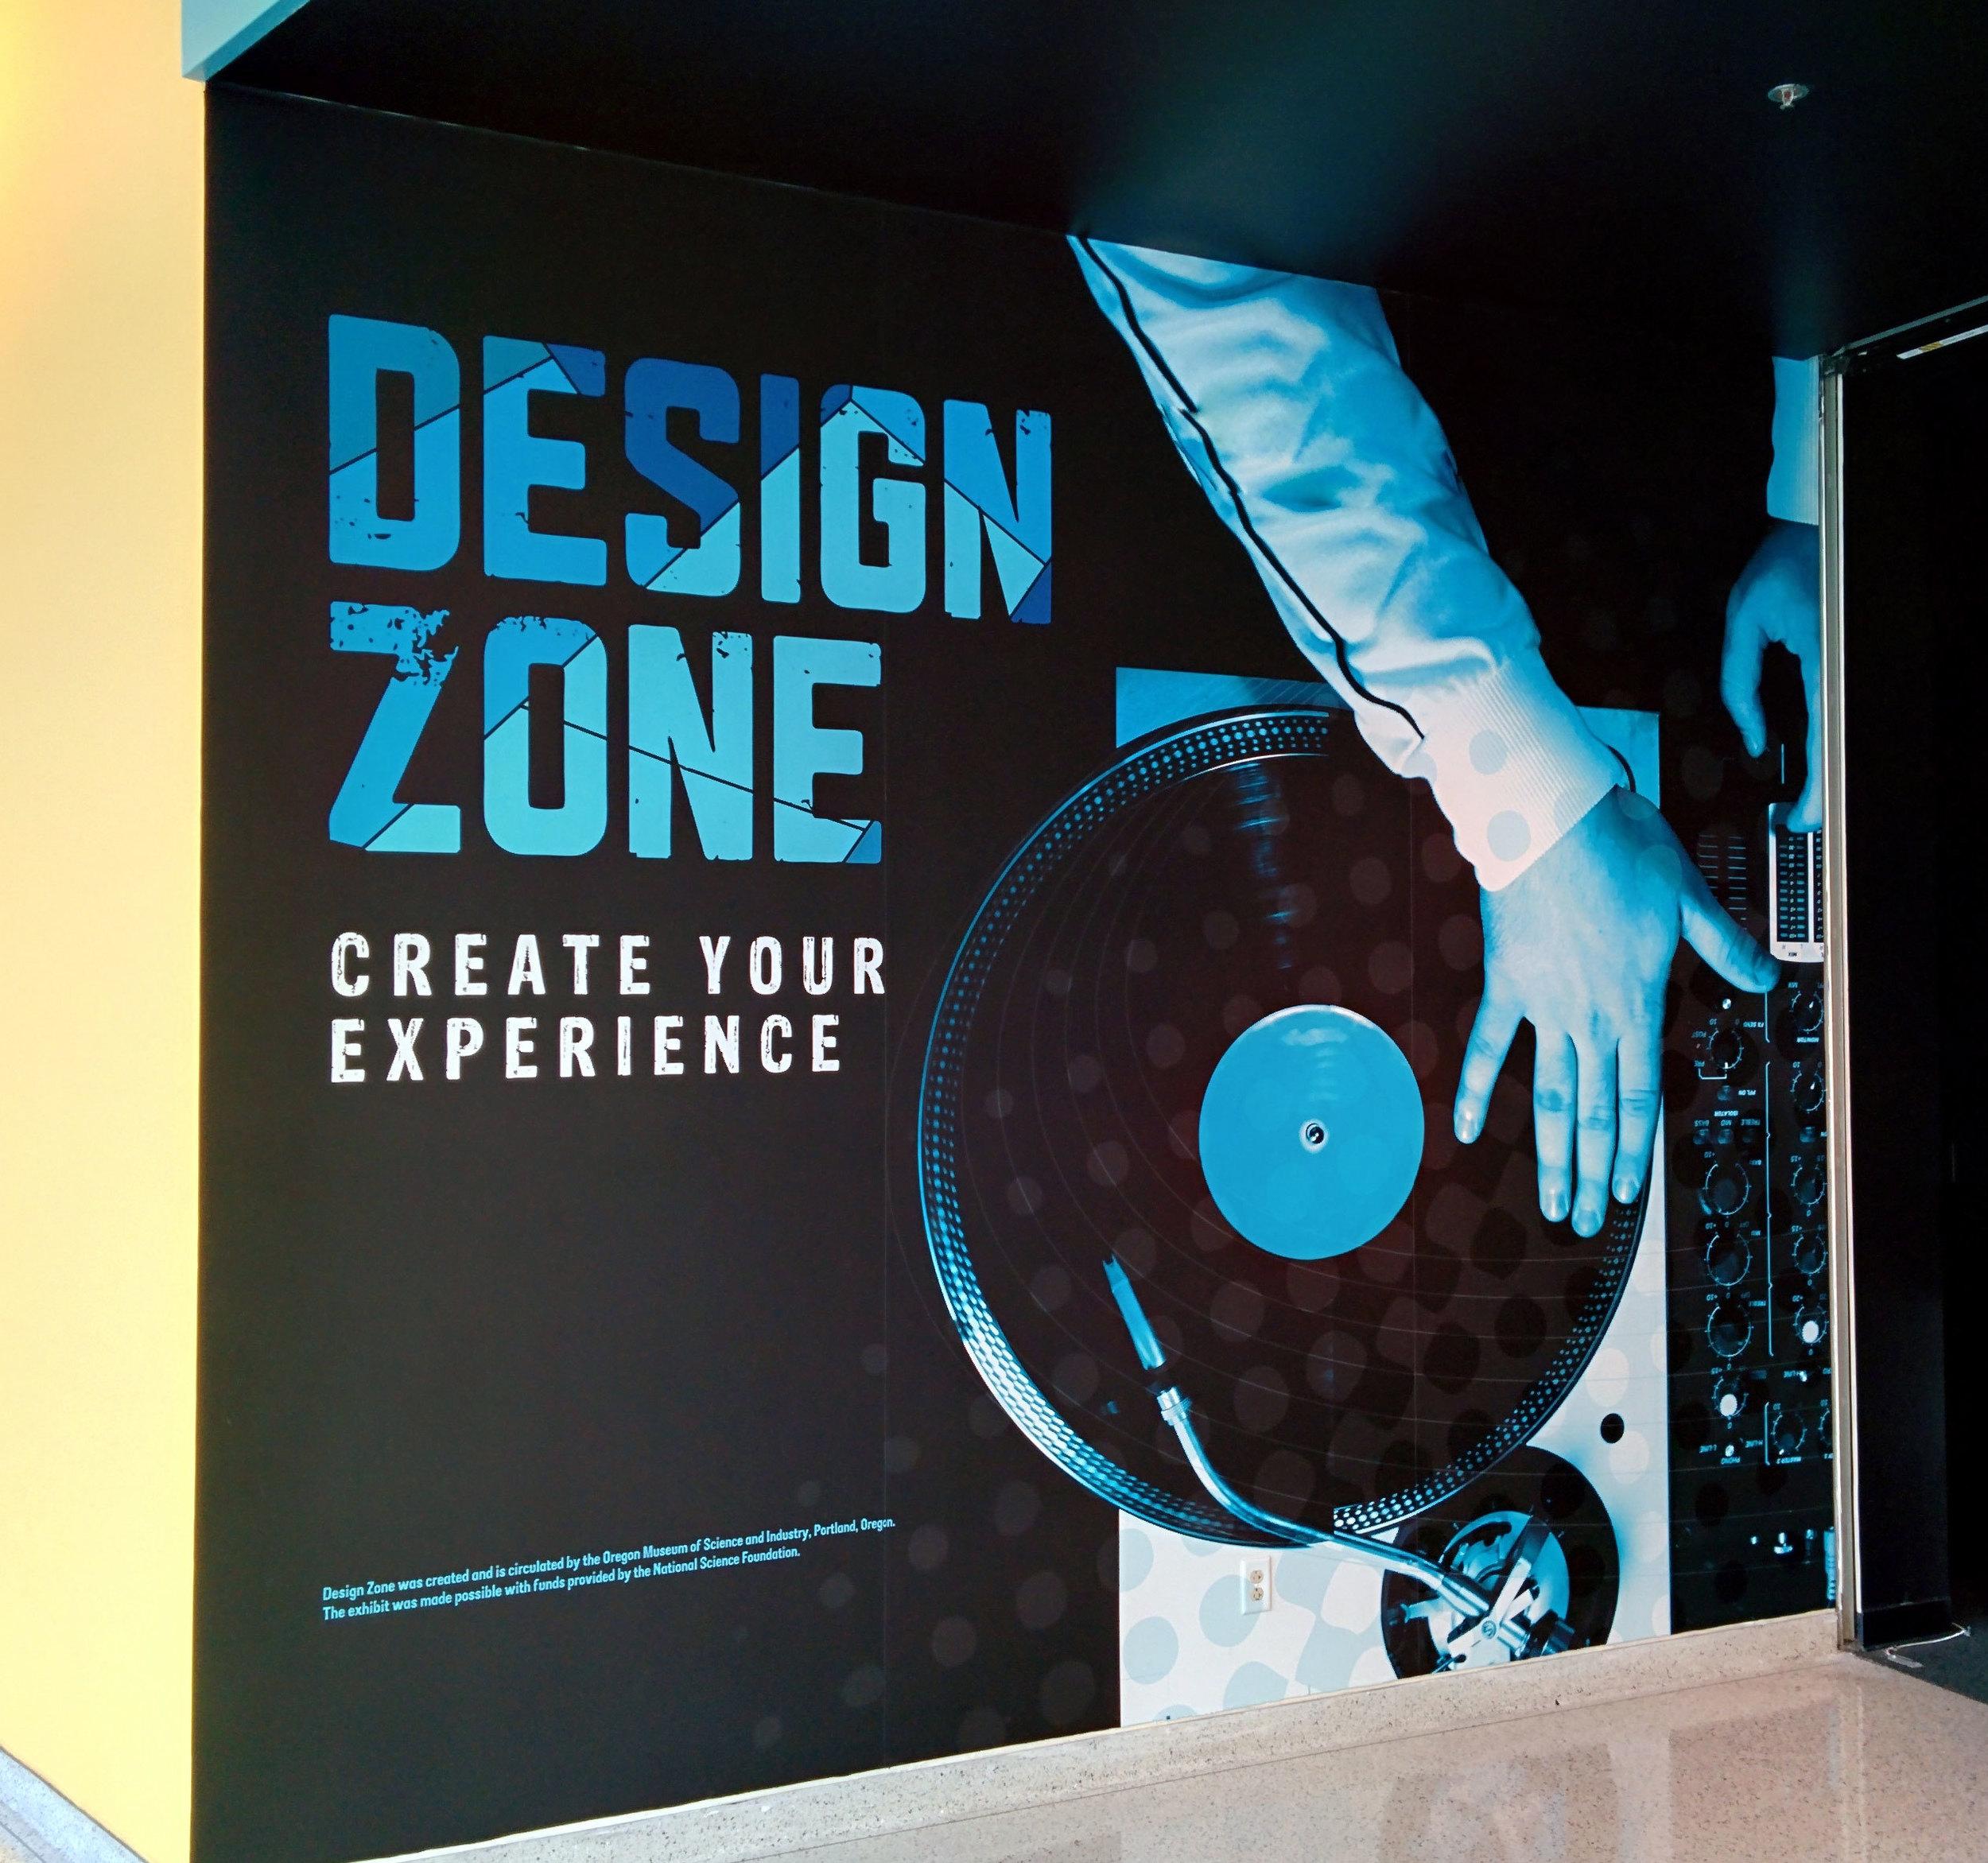 California Science Center Design Zone